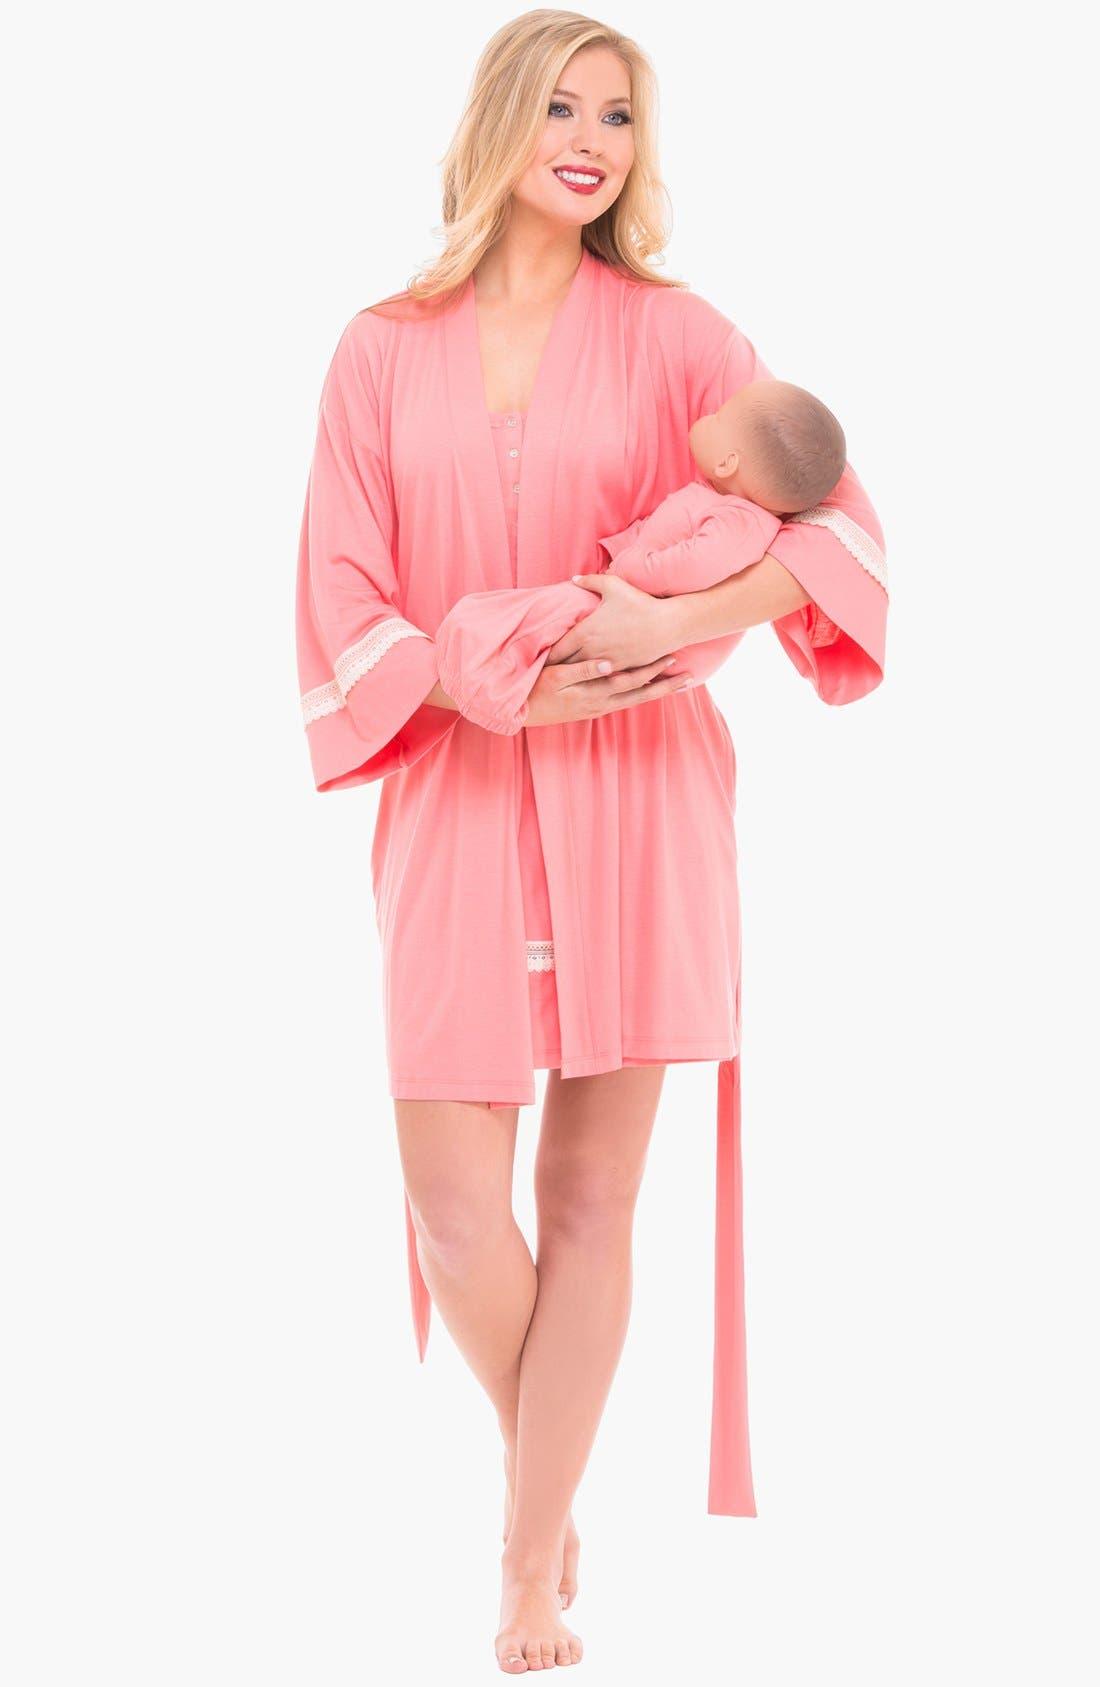 Alternate Image 1 Selected - Olian Three-Piece Maternity Sleepwear Gift Set